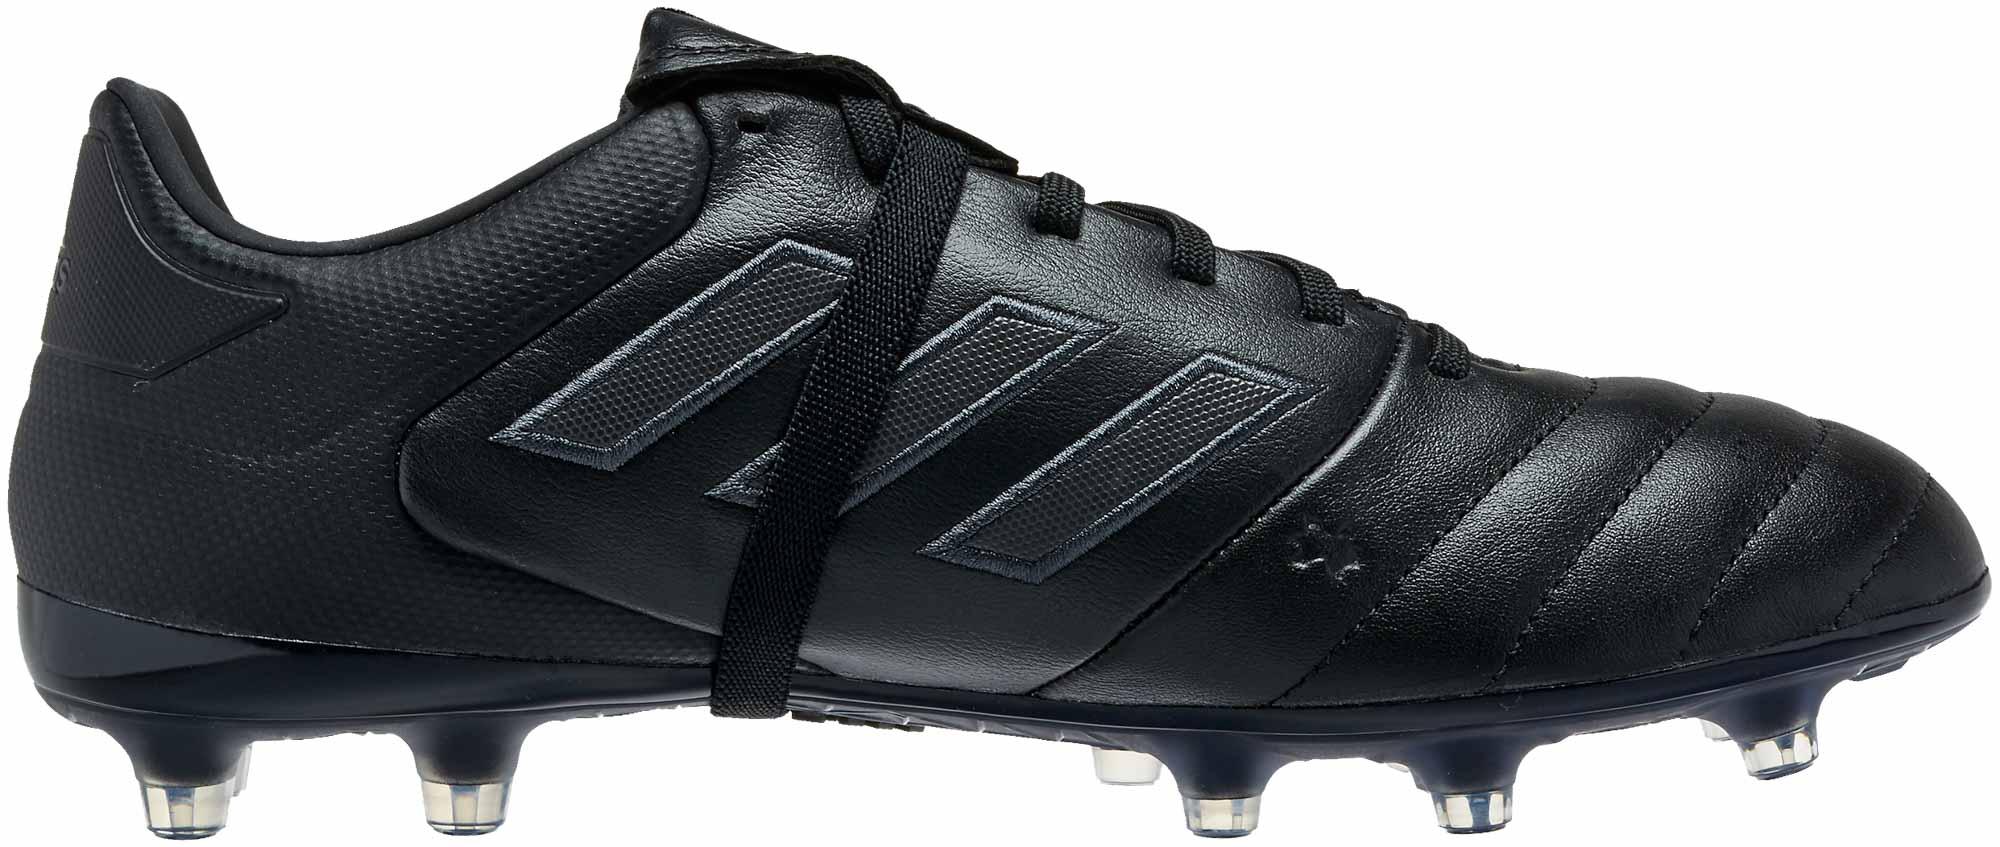 hot sales 2ad0a 43851 adidas Copa Gloro 17.2 FG - Core Black  Utility Black - Socc